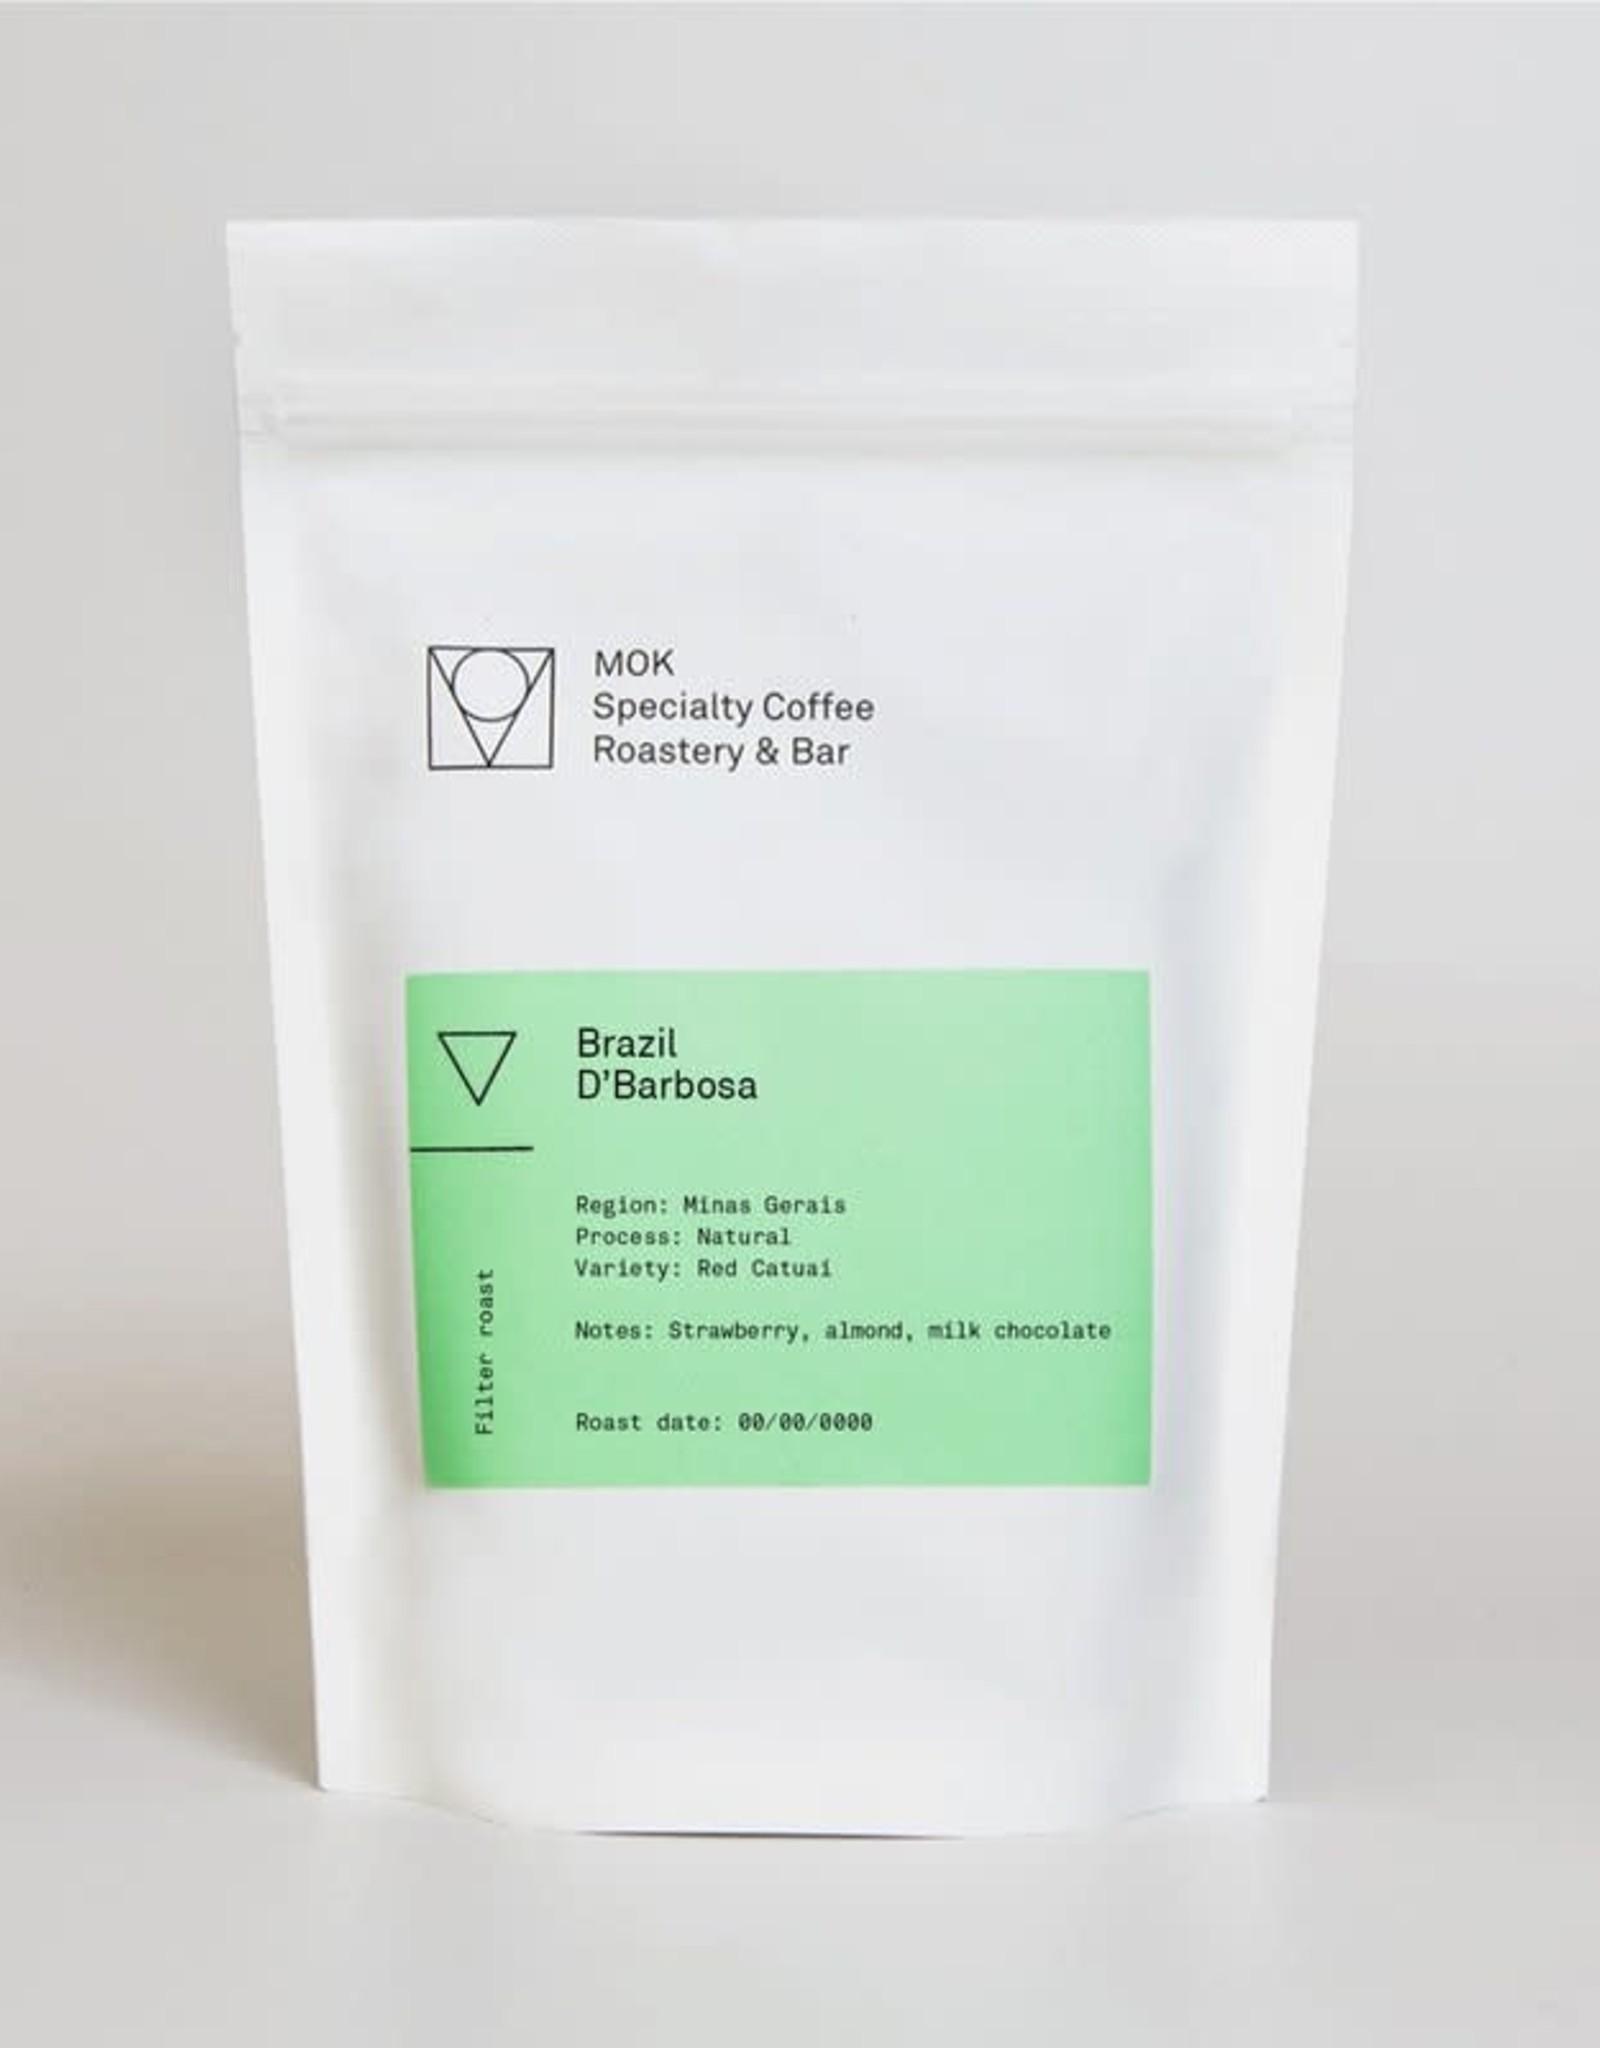 Filter Coffee - Brazil, D'Barbosa 250g